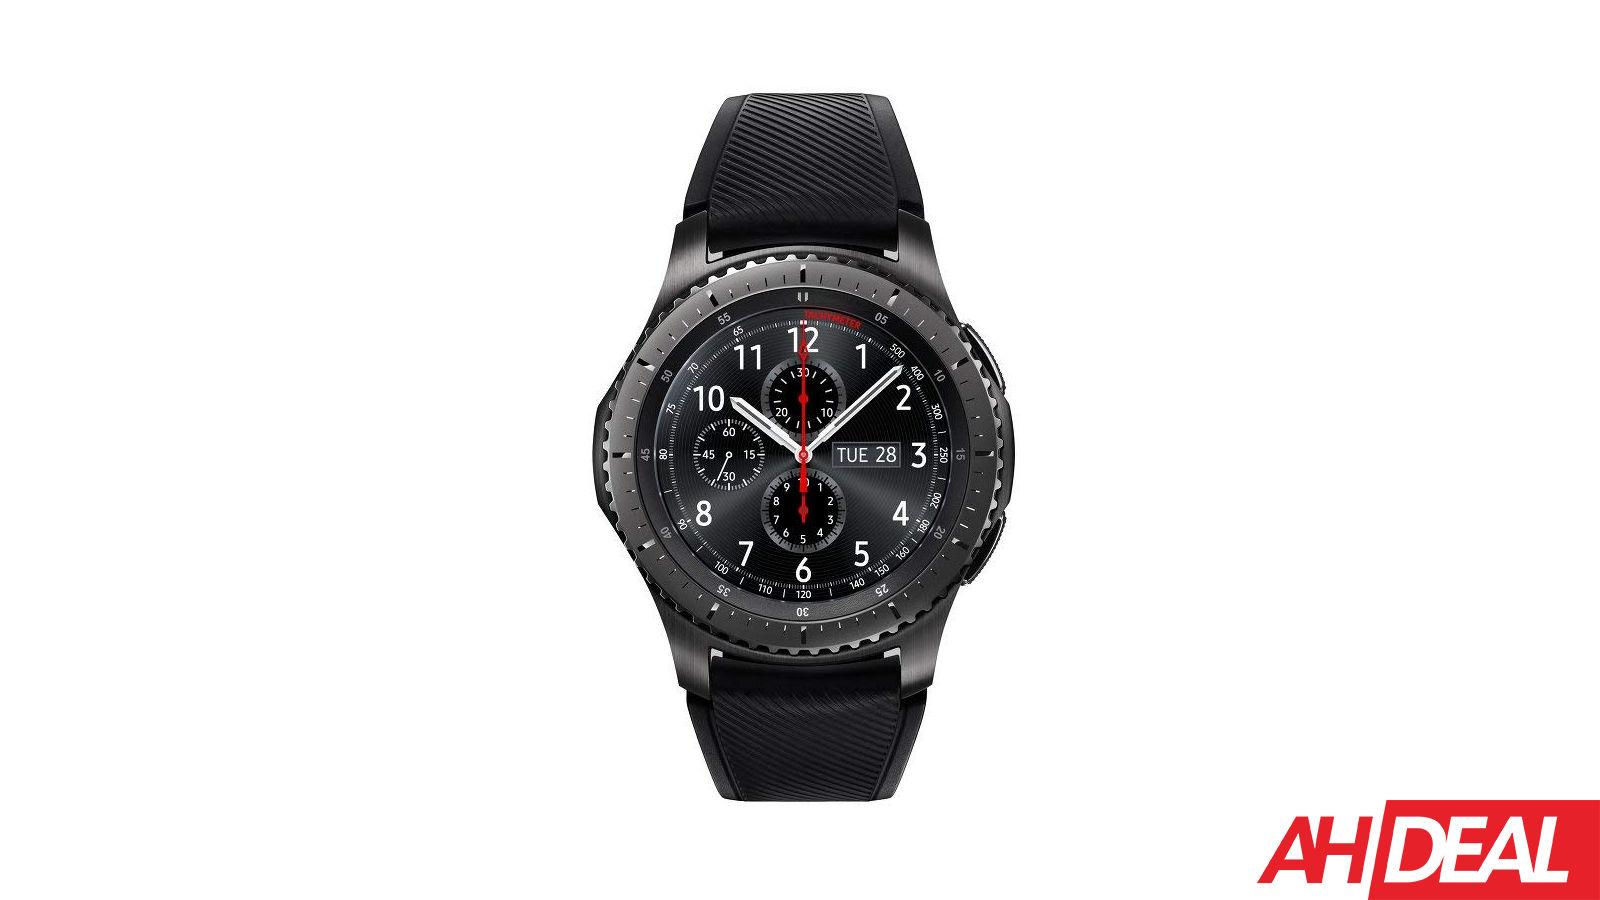 Samsung's Popular Gear S3 Frontier Smartwatch Has Dropped Below $200 – Amazon Deals